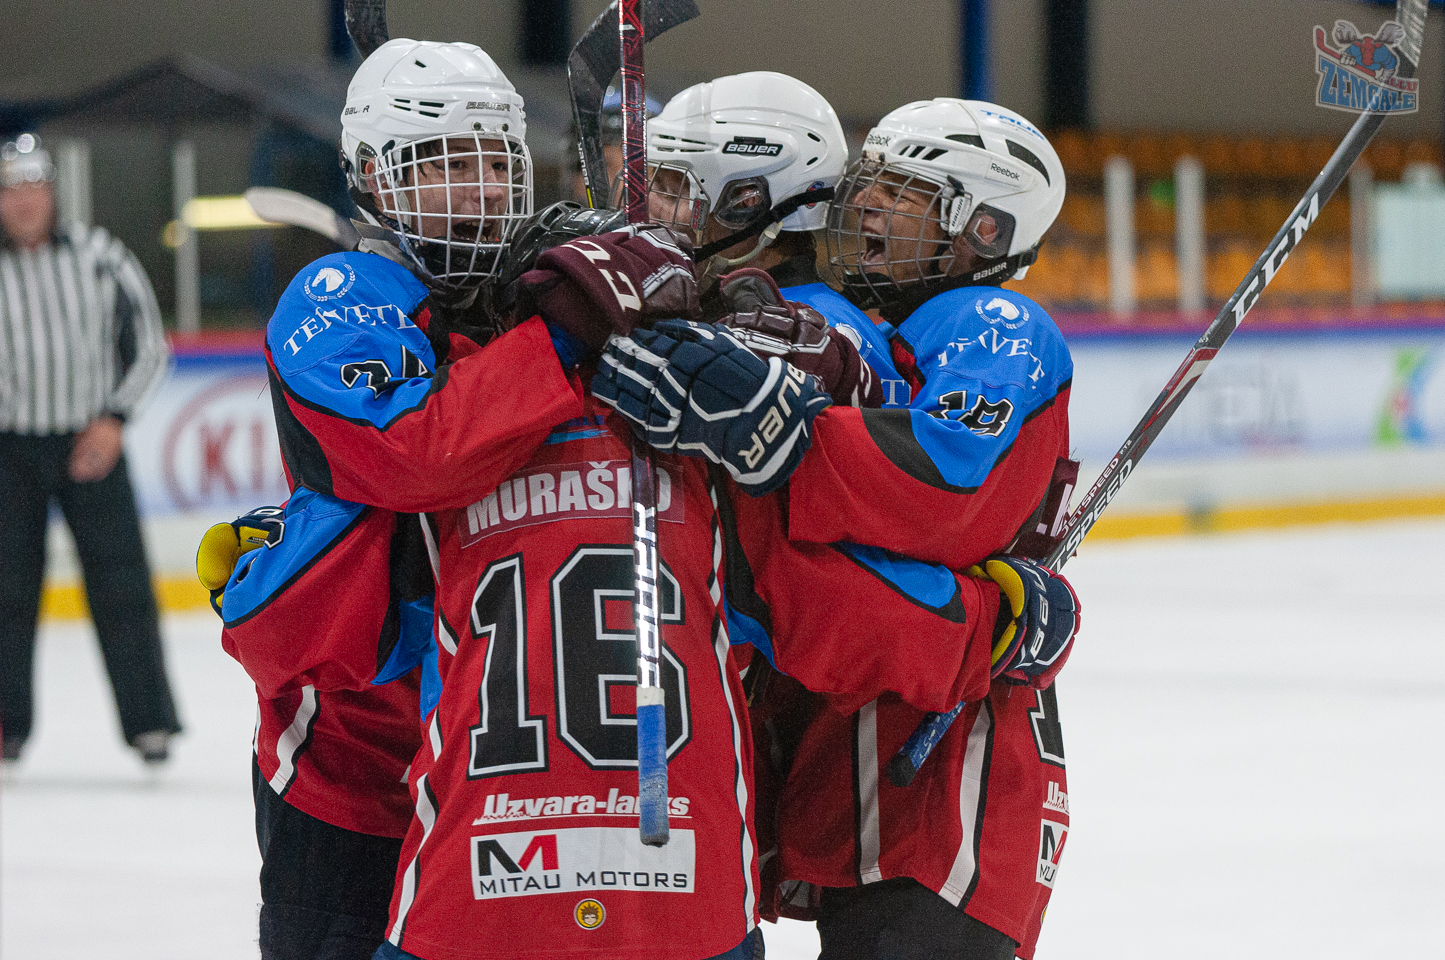 Jelgavas hokeja skola JLSS U17 - Venta 2002 14092019-11